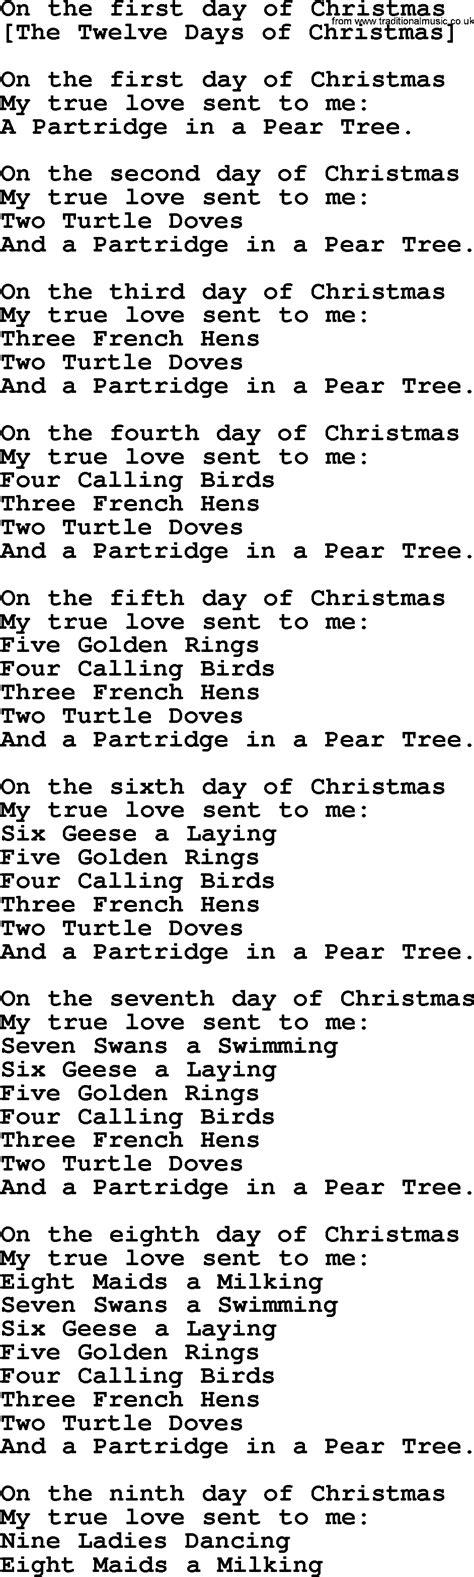 s day came early lyrics song lizardmedia co